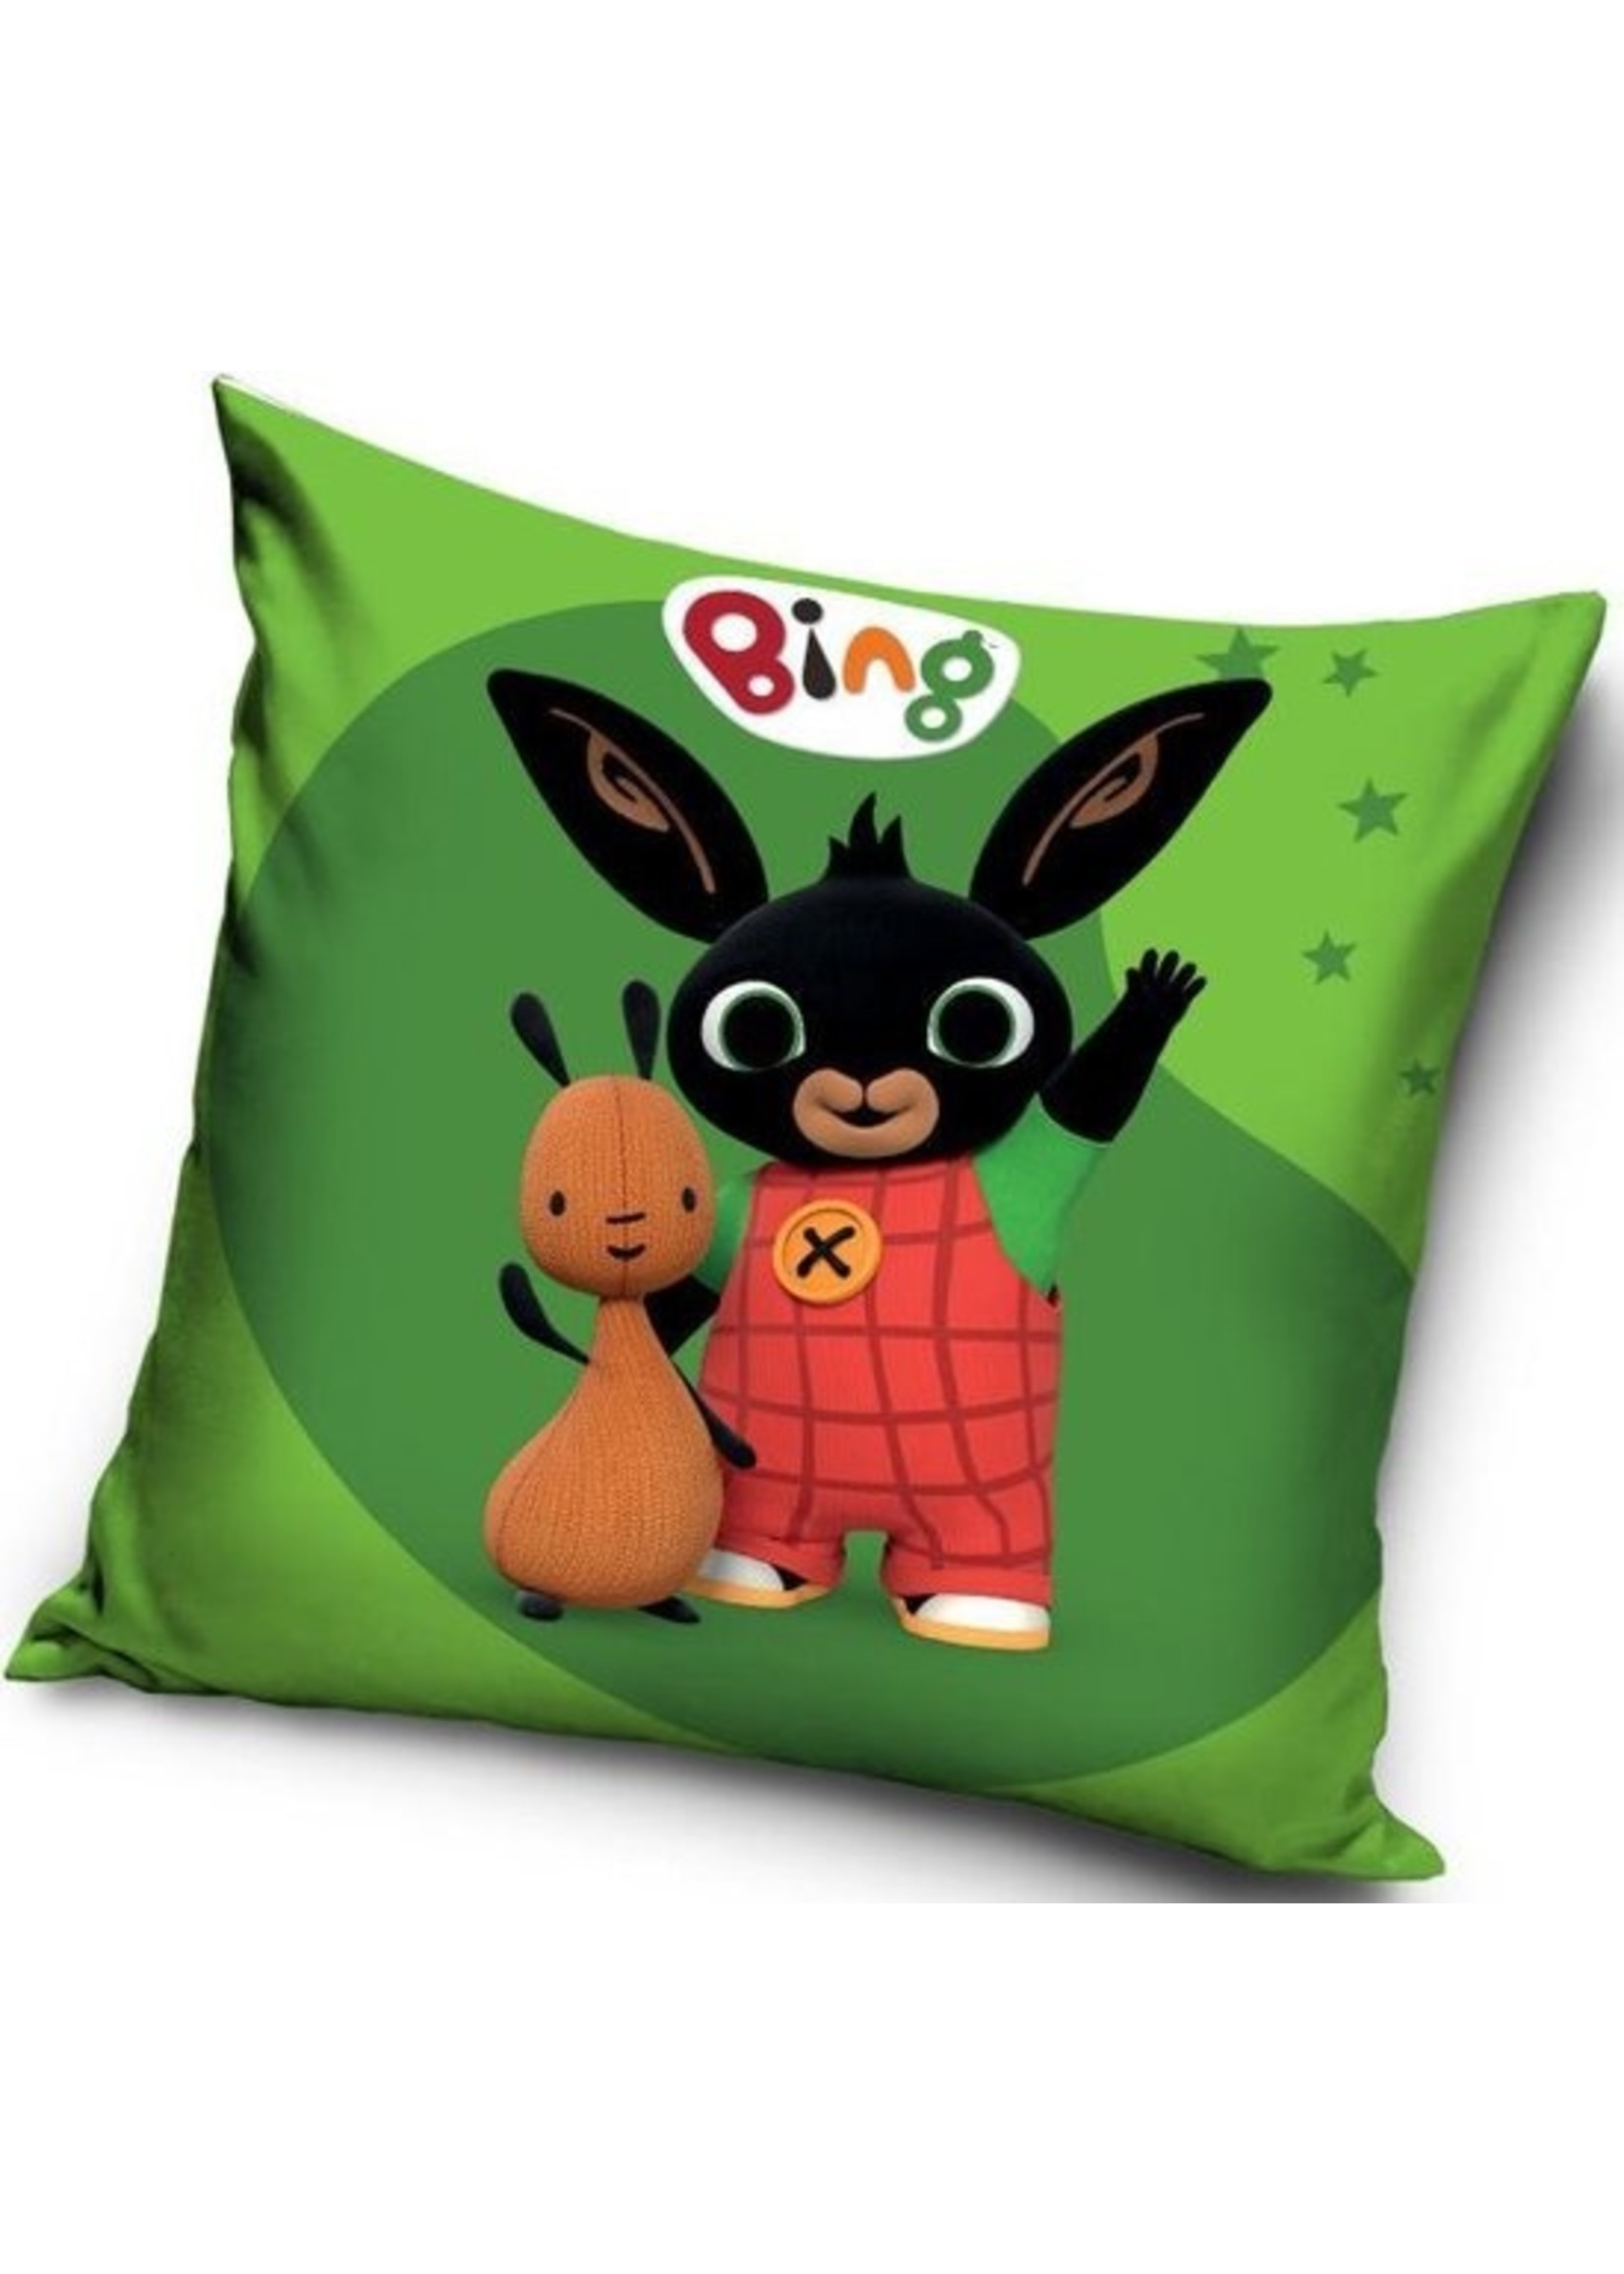 Bing Bunny - Sierkussen Kussen 40 x 40 cm inclusief vulling